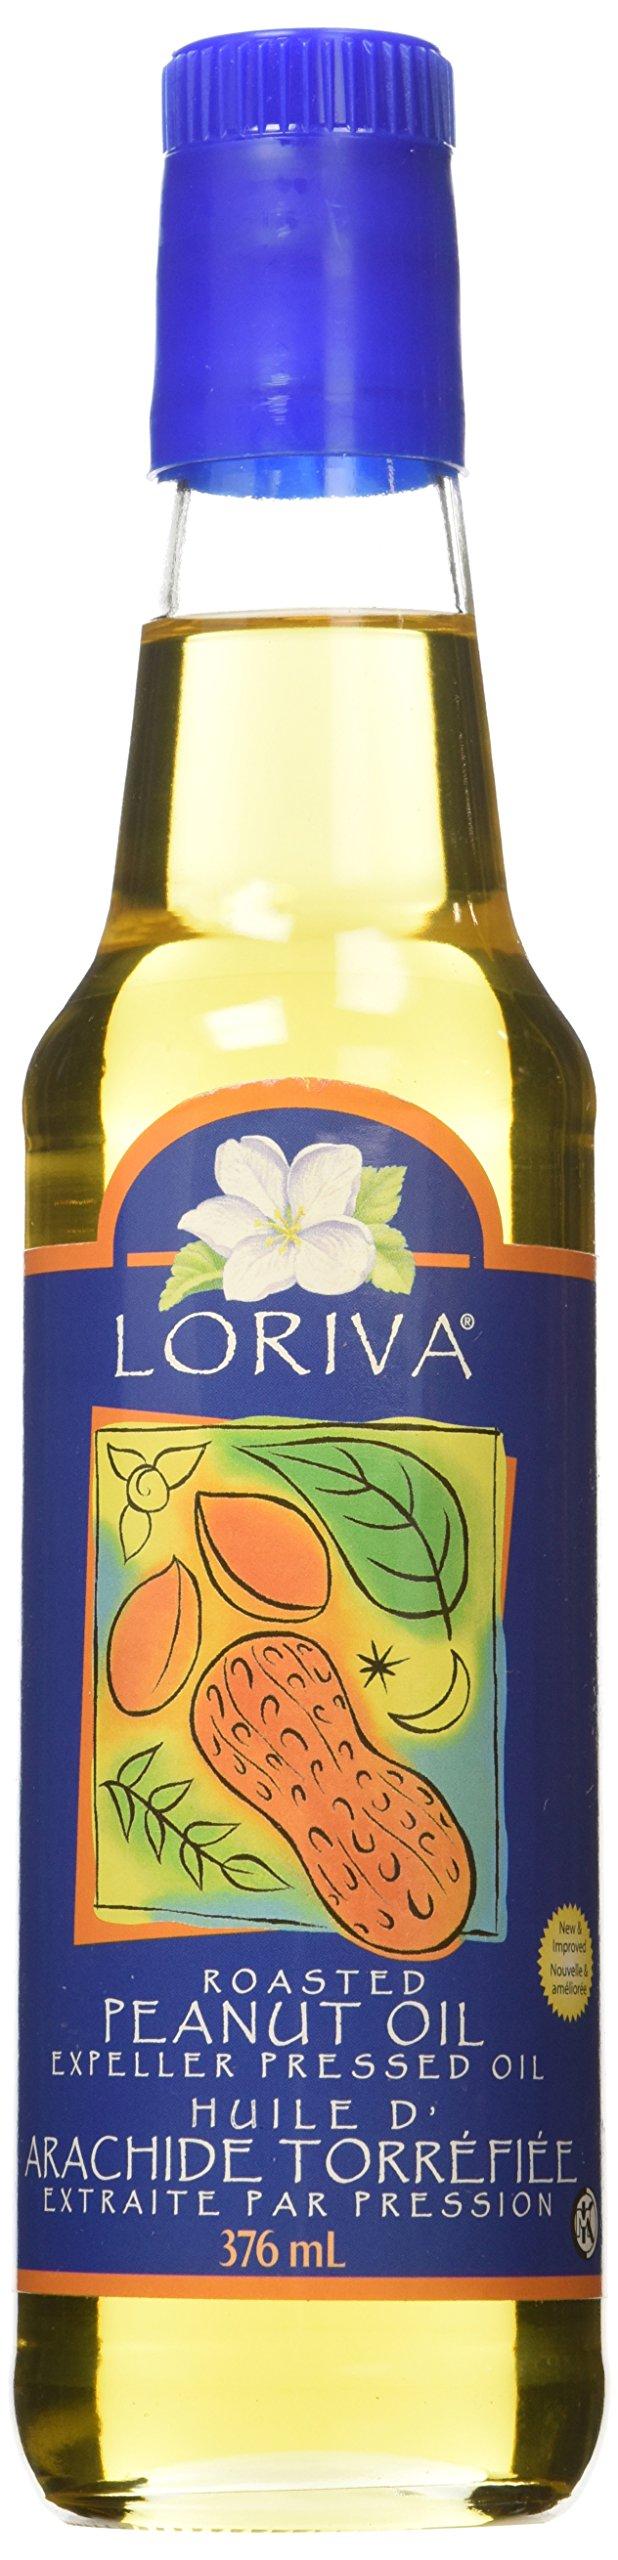 Loriva Canadian Oil, Roasted Peanut, 12.7 Ounce